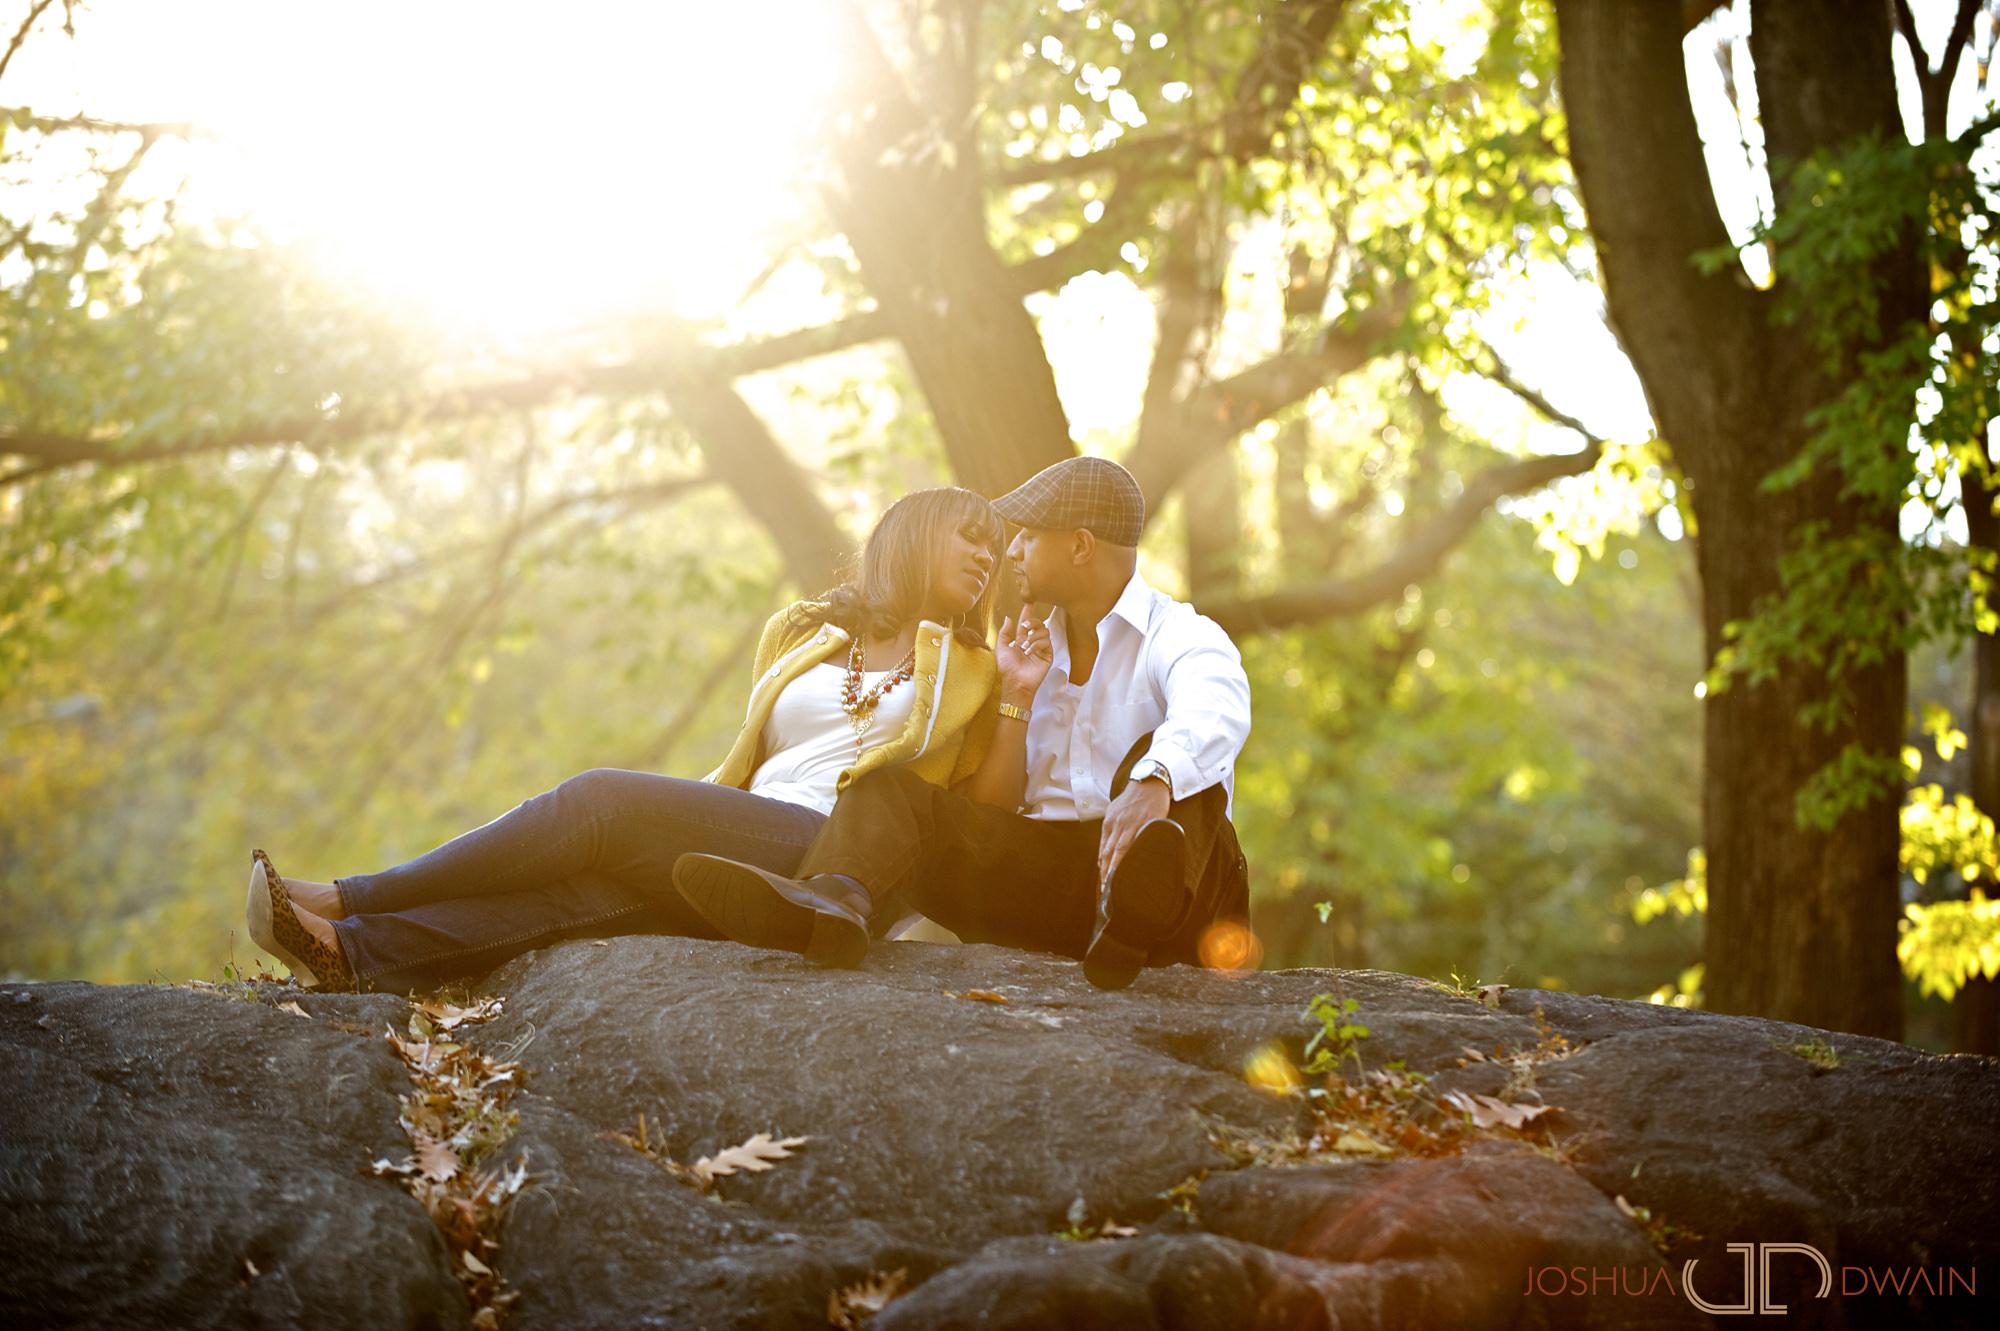 carol-shiloh-001-central-park-new-york-city-engagement-photographer-joshua-dwain-03